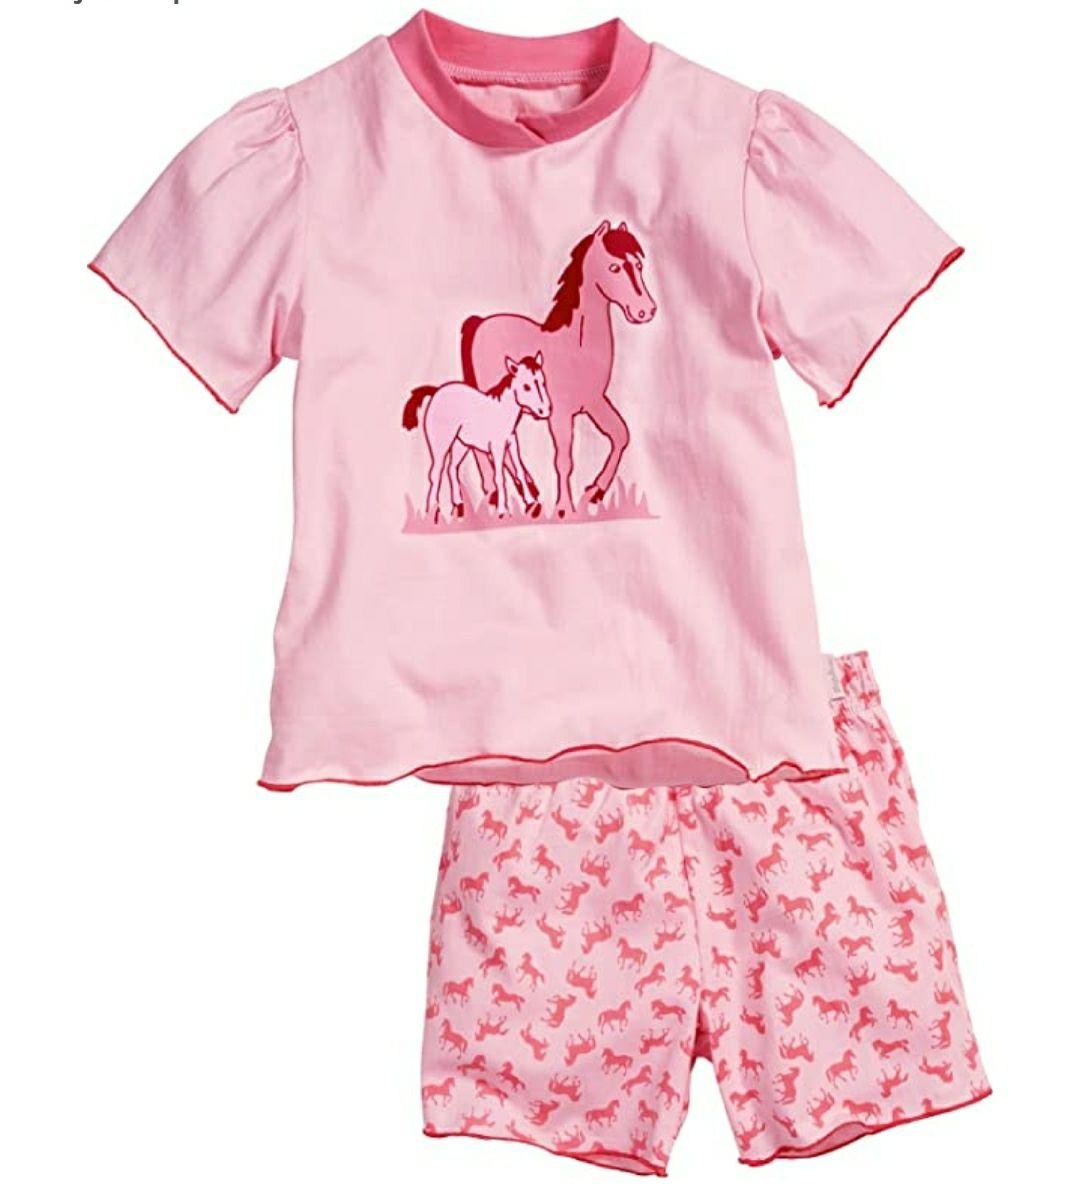 TALLA 12 MESES - Playshoes Schlafanzug Shorty Single-Jersey Pferde Pijama para Niños